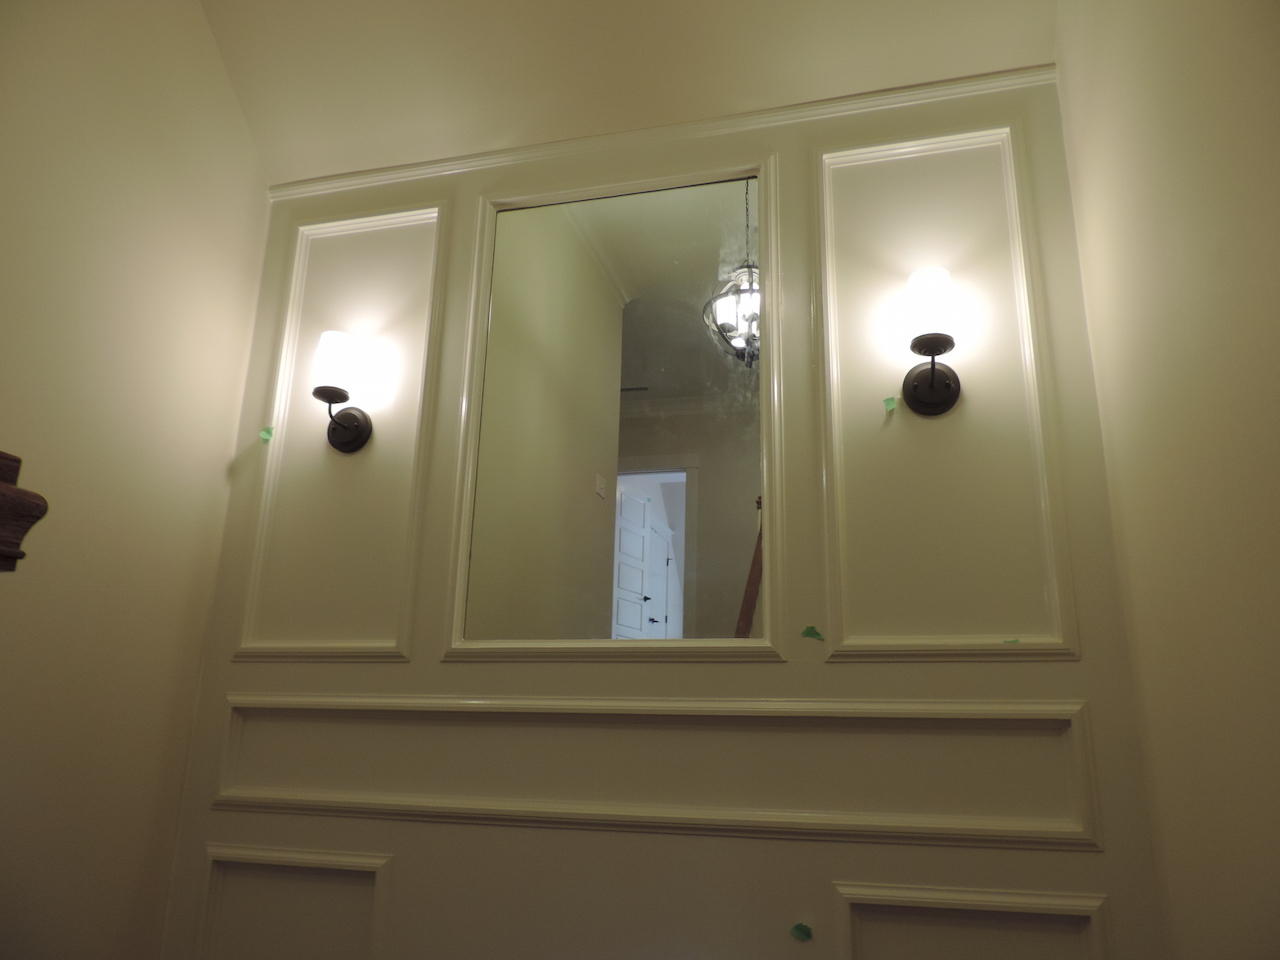 Polished Edge Mirror 26